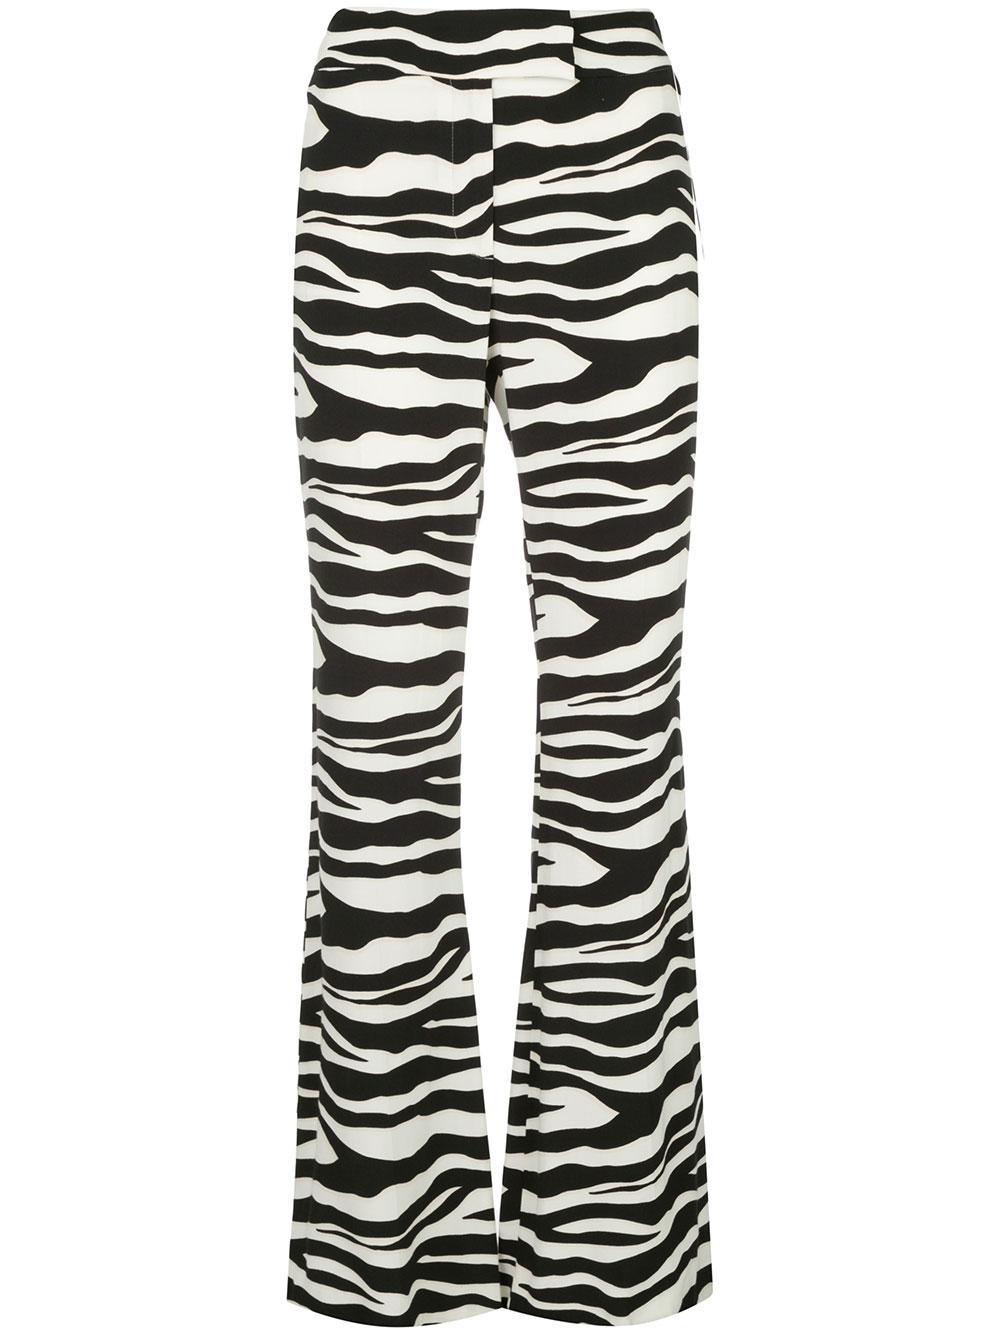 Dona Zebra Suit Pant